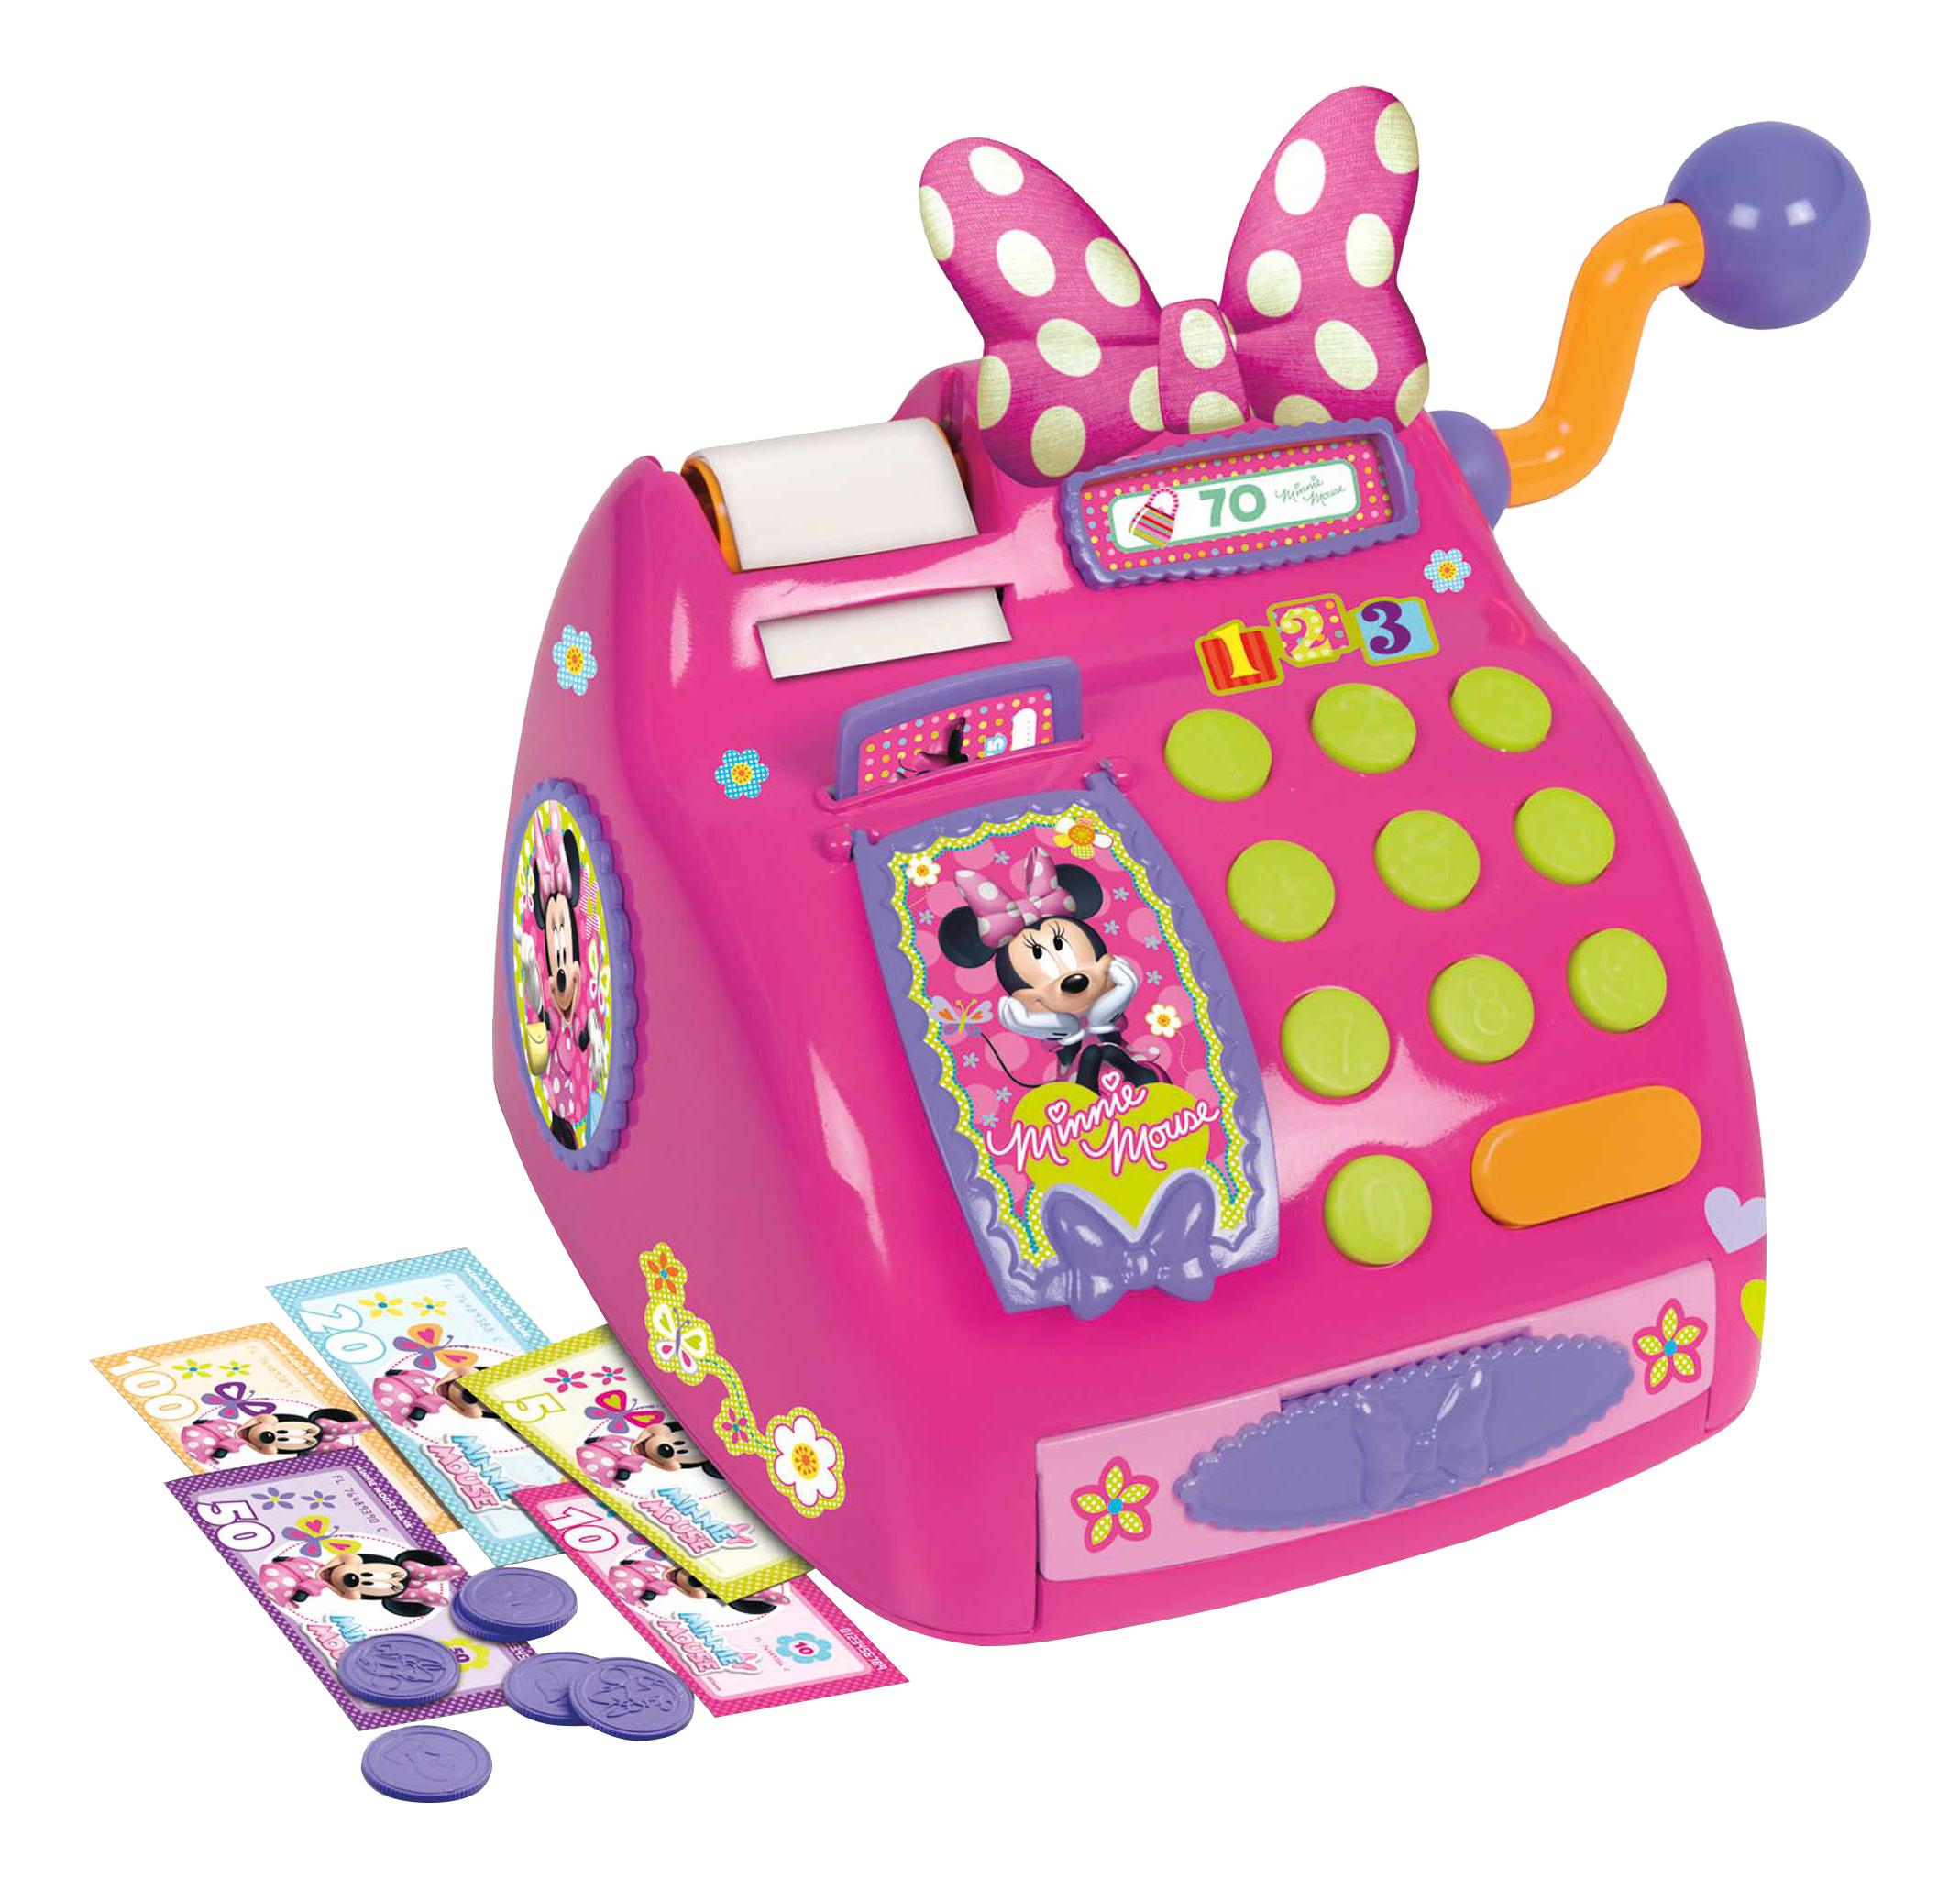 Касса игрушечная IMC toys Касса Minnie